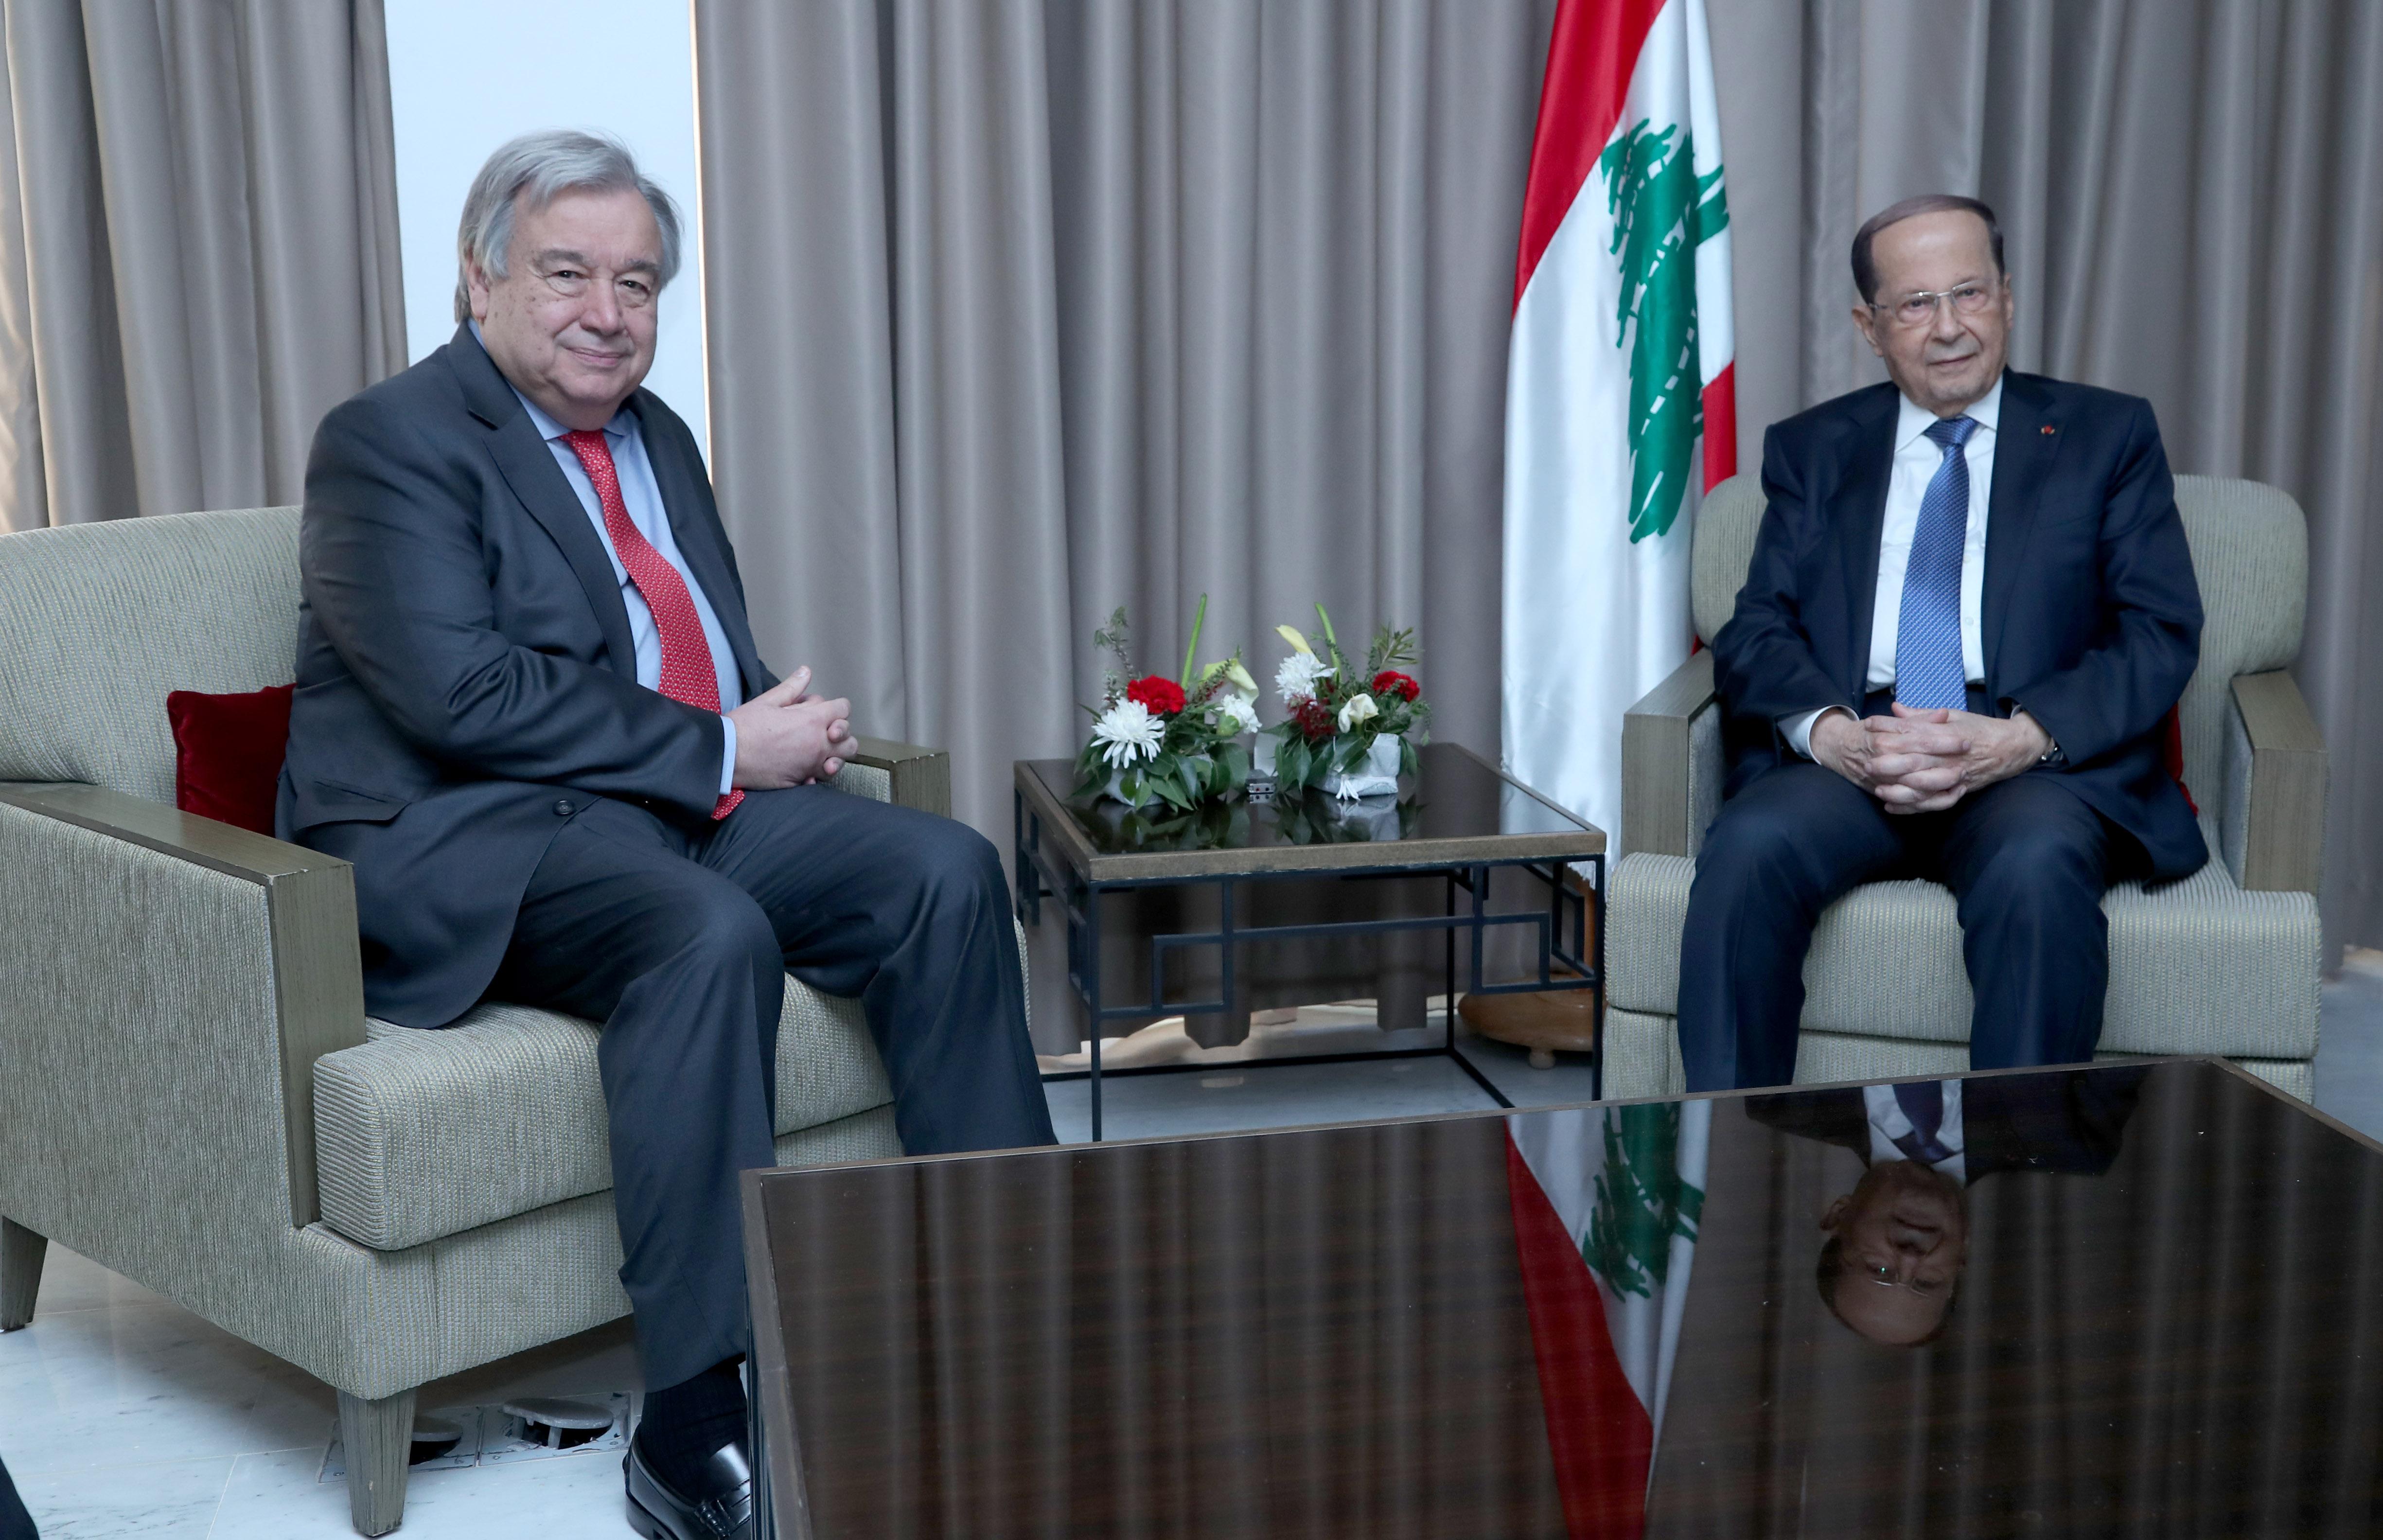 002 aUN Secretary-General António Guterres